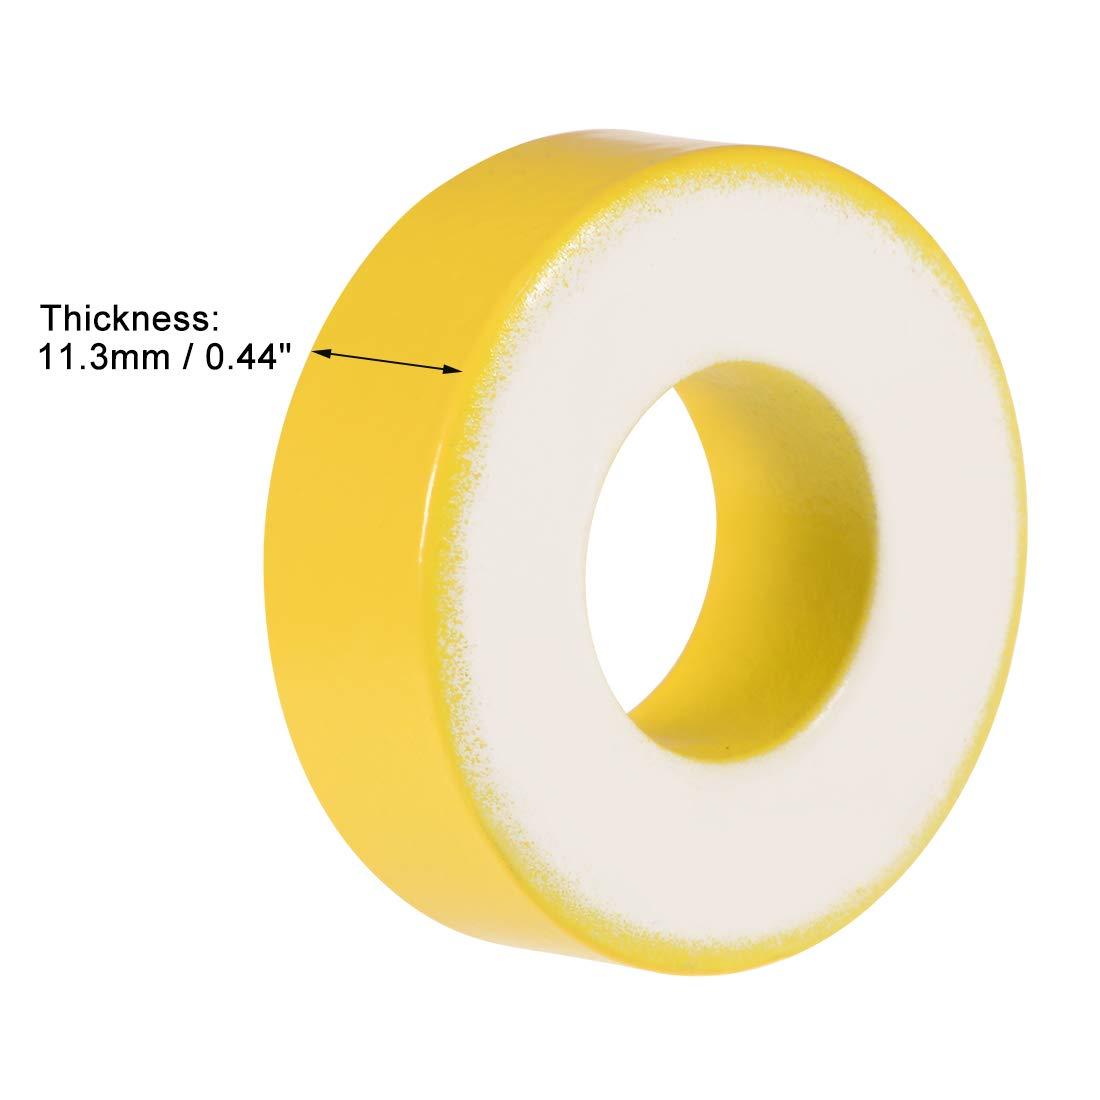 Yellow White 2pcs Ferrite Chokes Ring Iron Powder Inductor Ferrite Rings 8.2 x 15.5 x 6.2mm uxcell Toroid Core